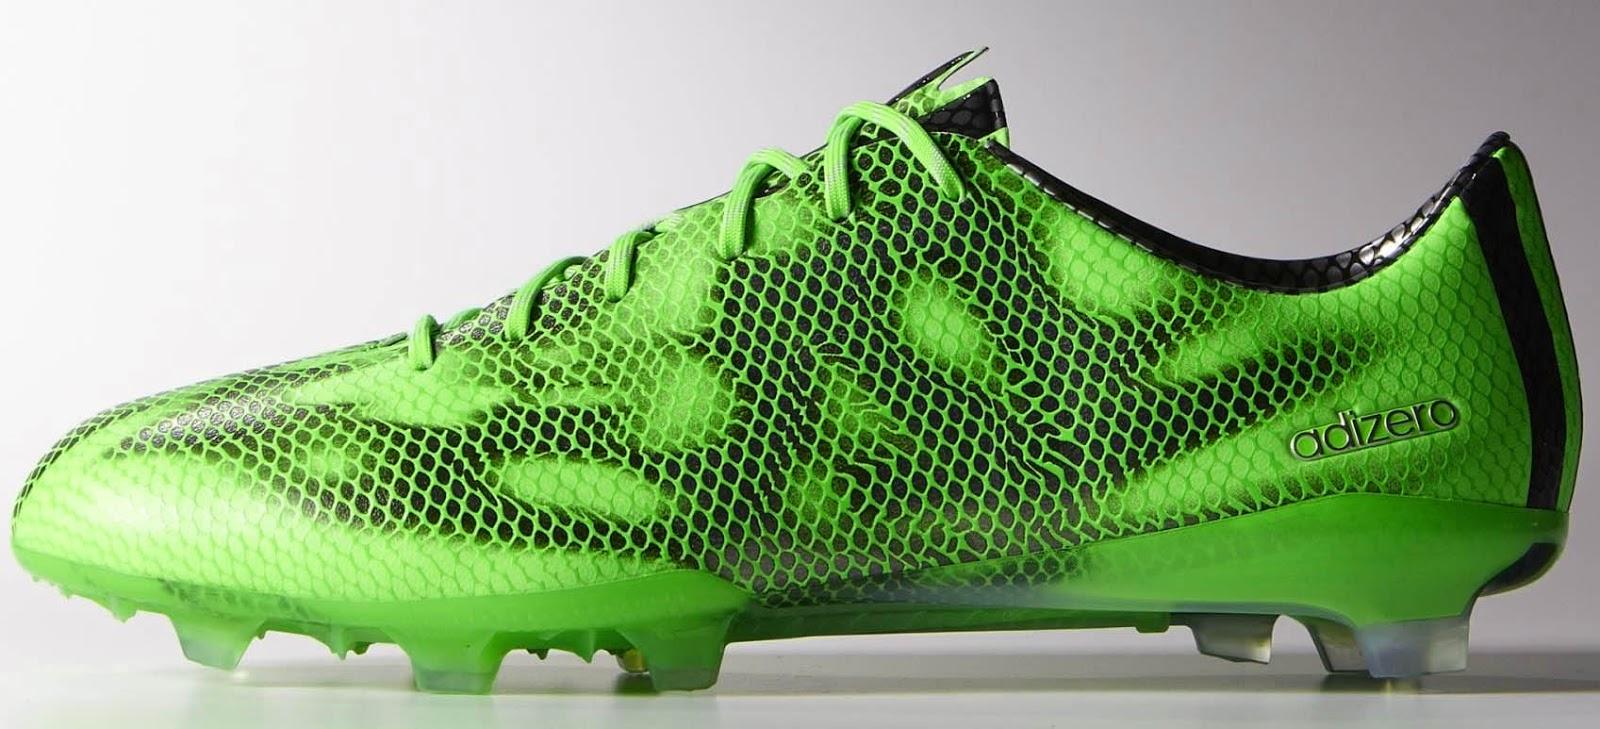 solar green adidas f50 adizero summer 2015 boots released. Black Bedroom Furniture Sets. Home Design Ideas